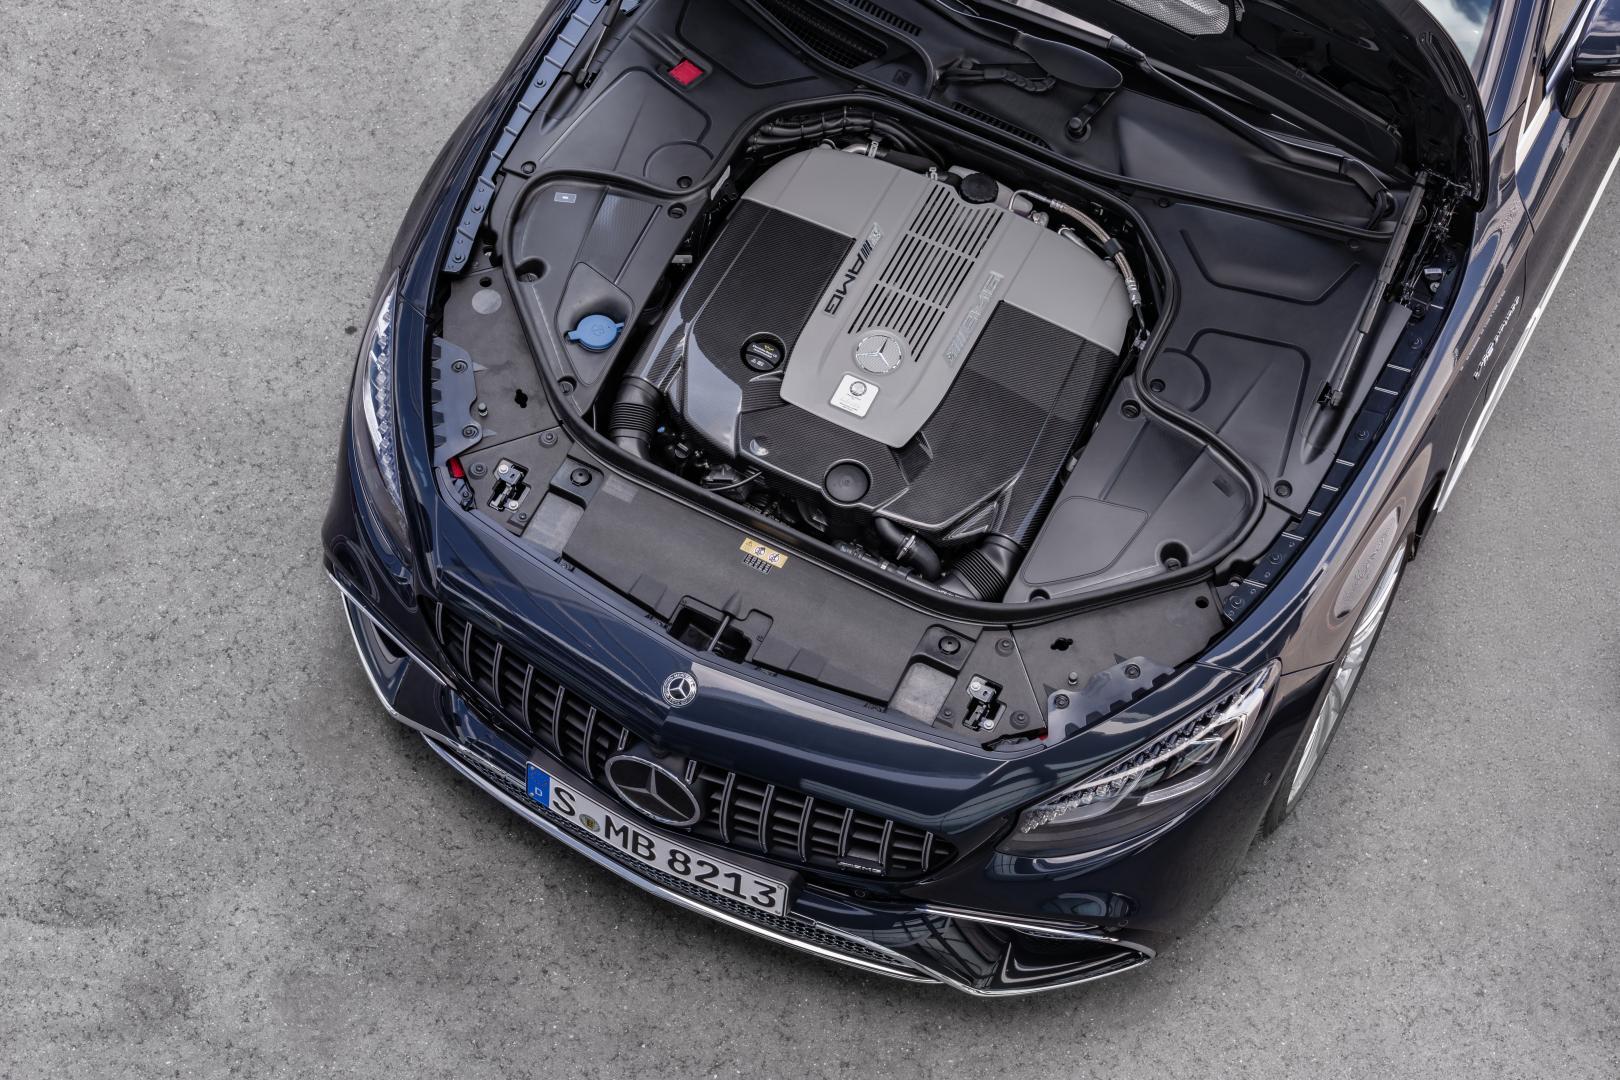 Mercedes-AMG S 65 V12 badge logo